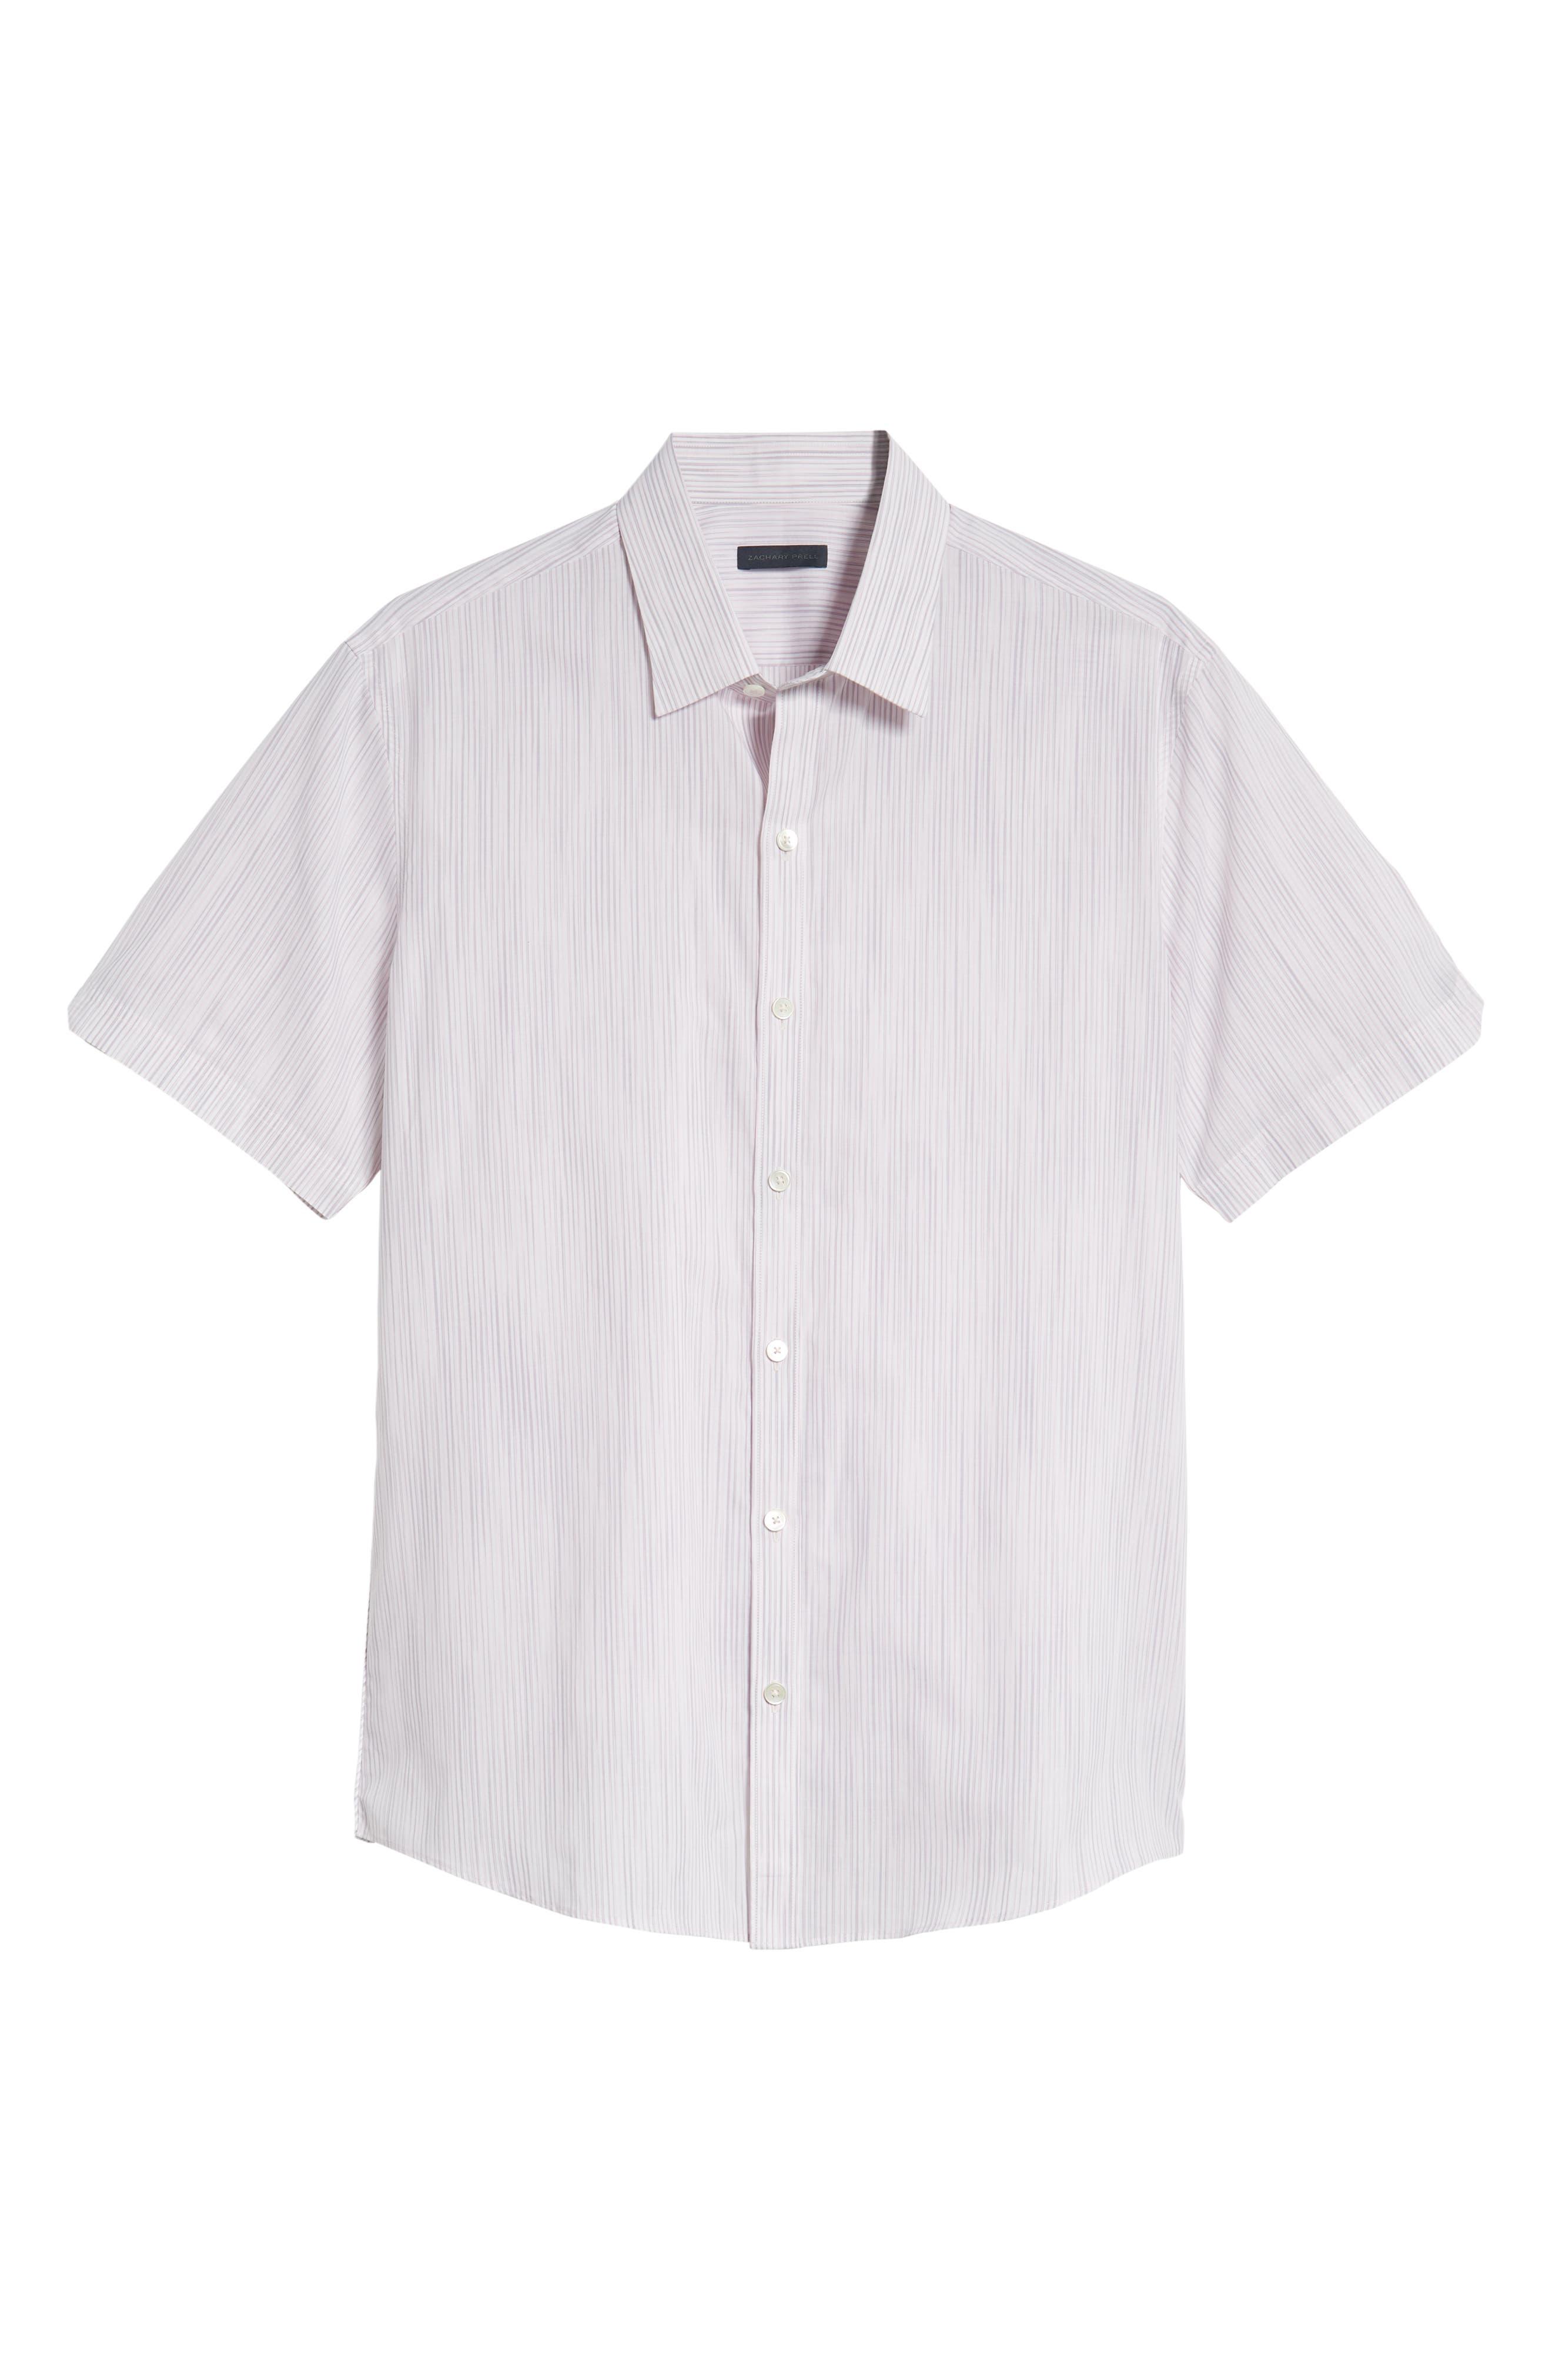 Bella Regular Fit Sport Shirt,                             Alternate thumbnail 5, color,                             LIGHT PINK